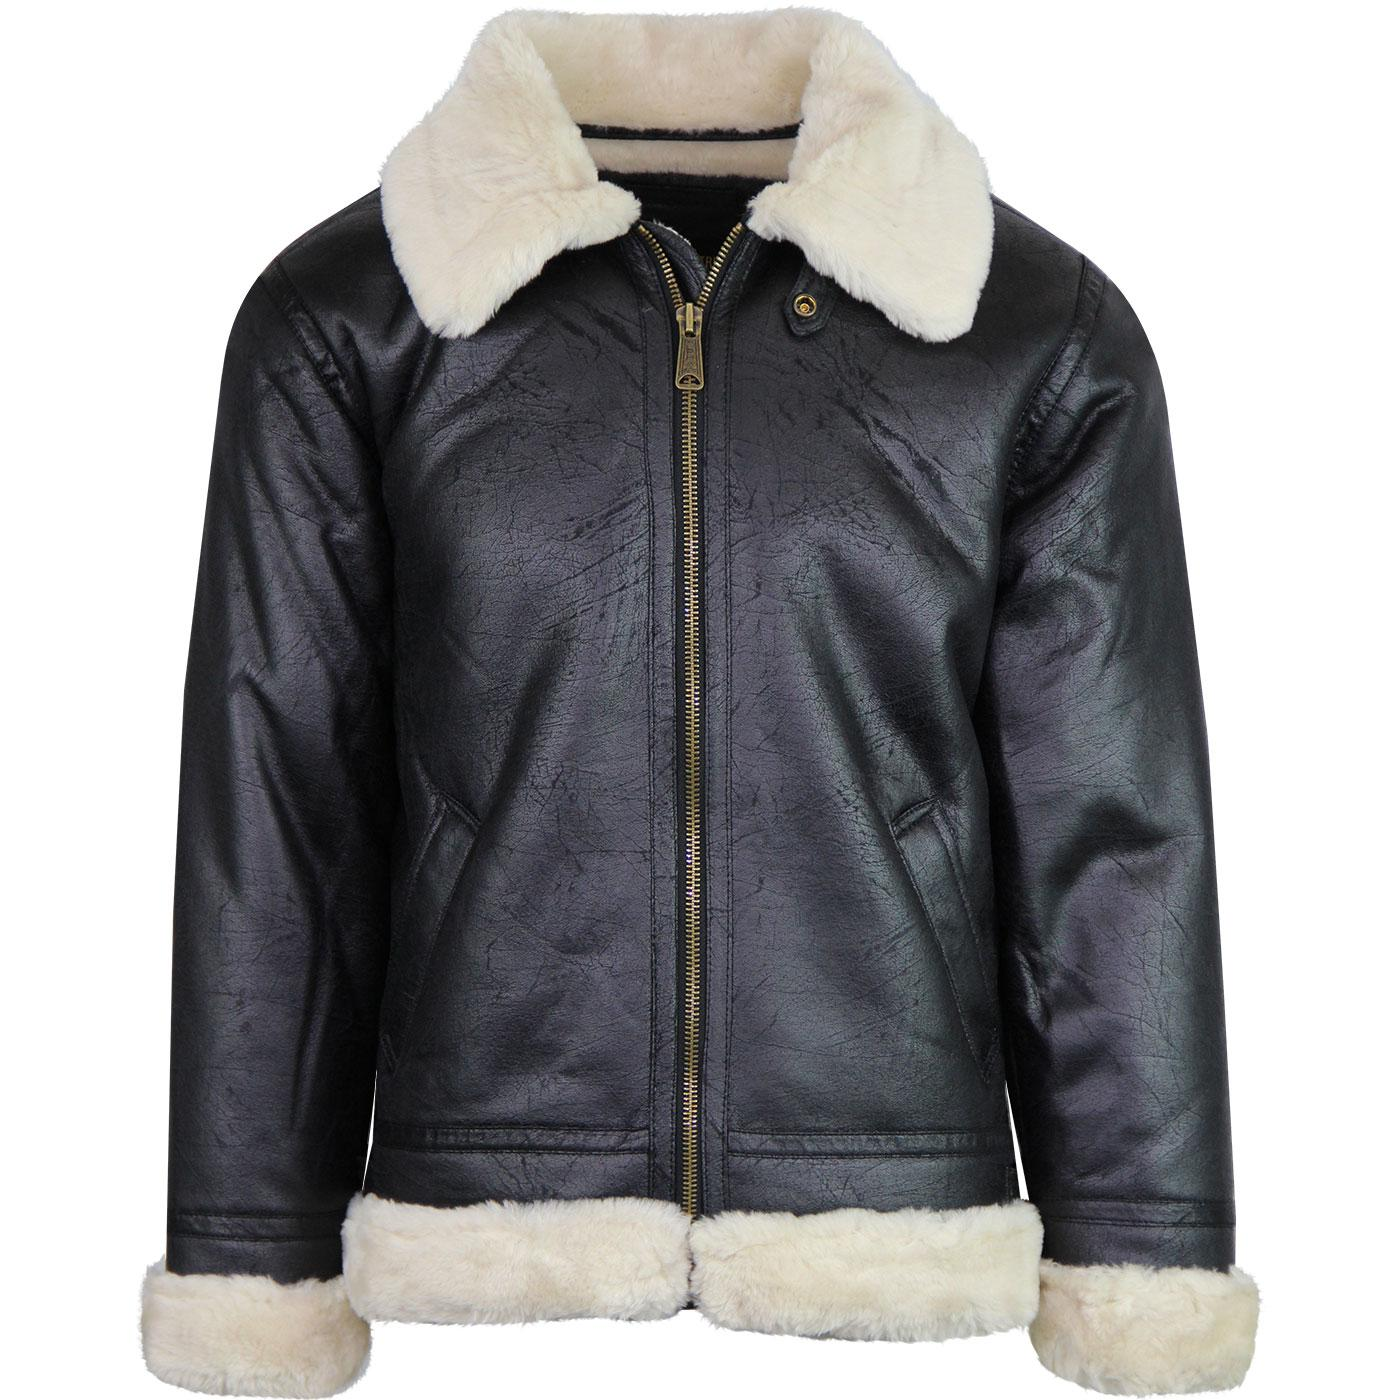 ALPHA INDUSTRIES Faux Leather B3 Flight Jacket Blk